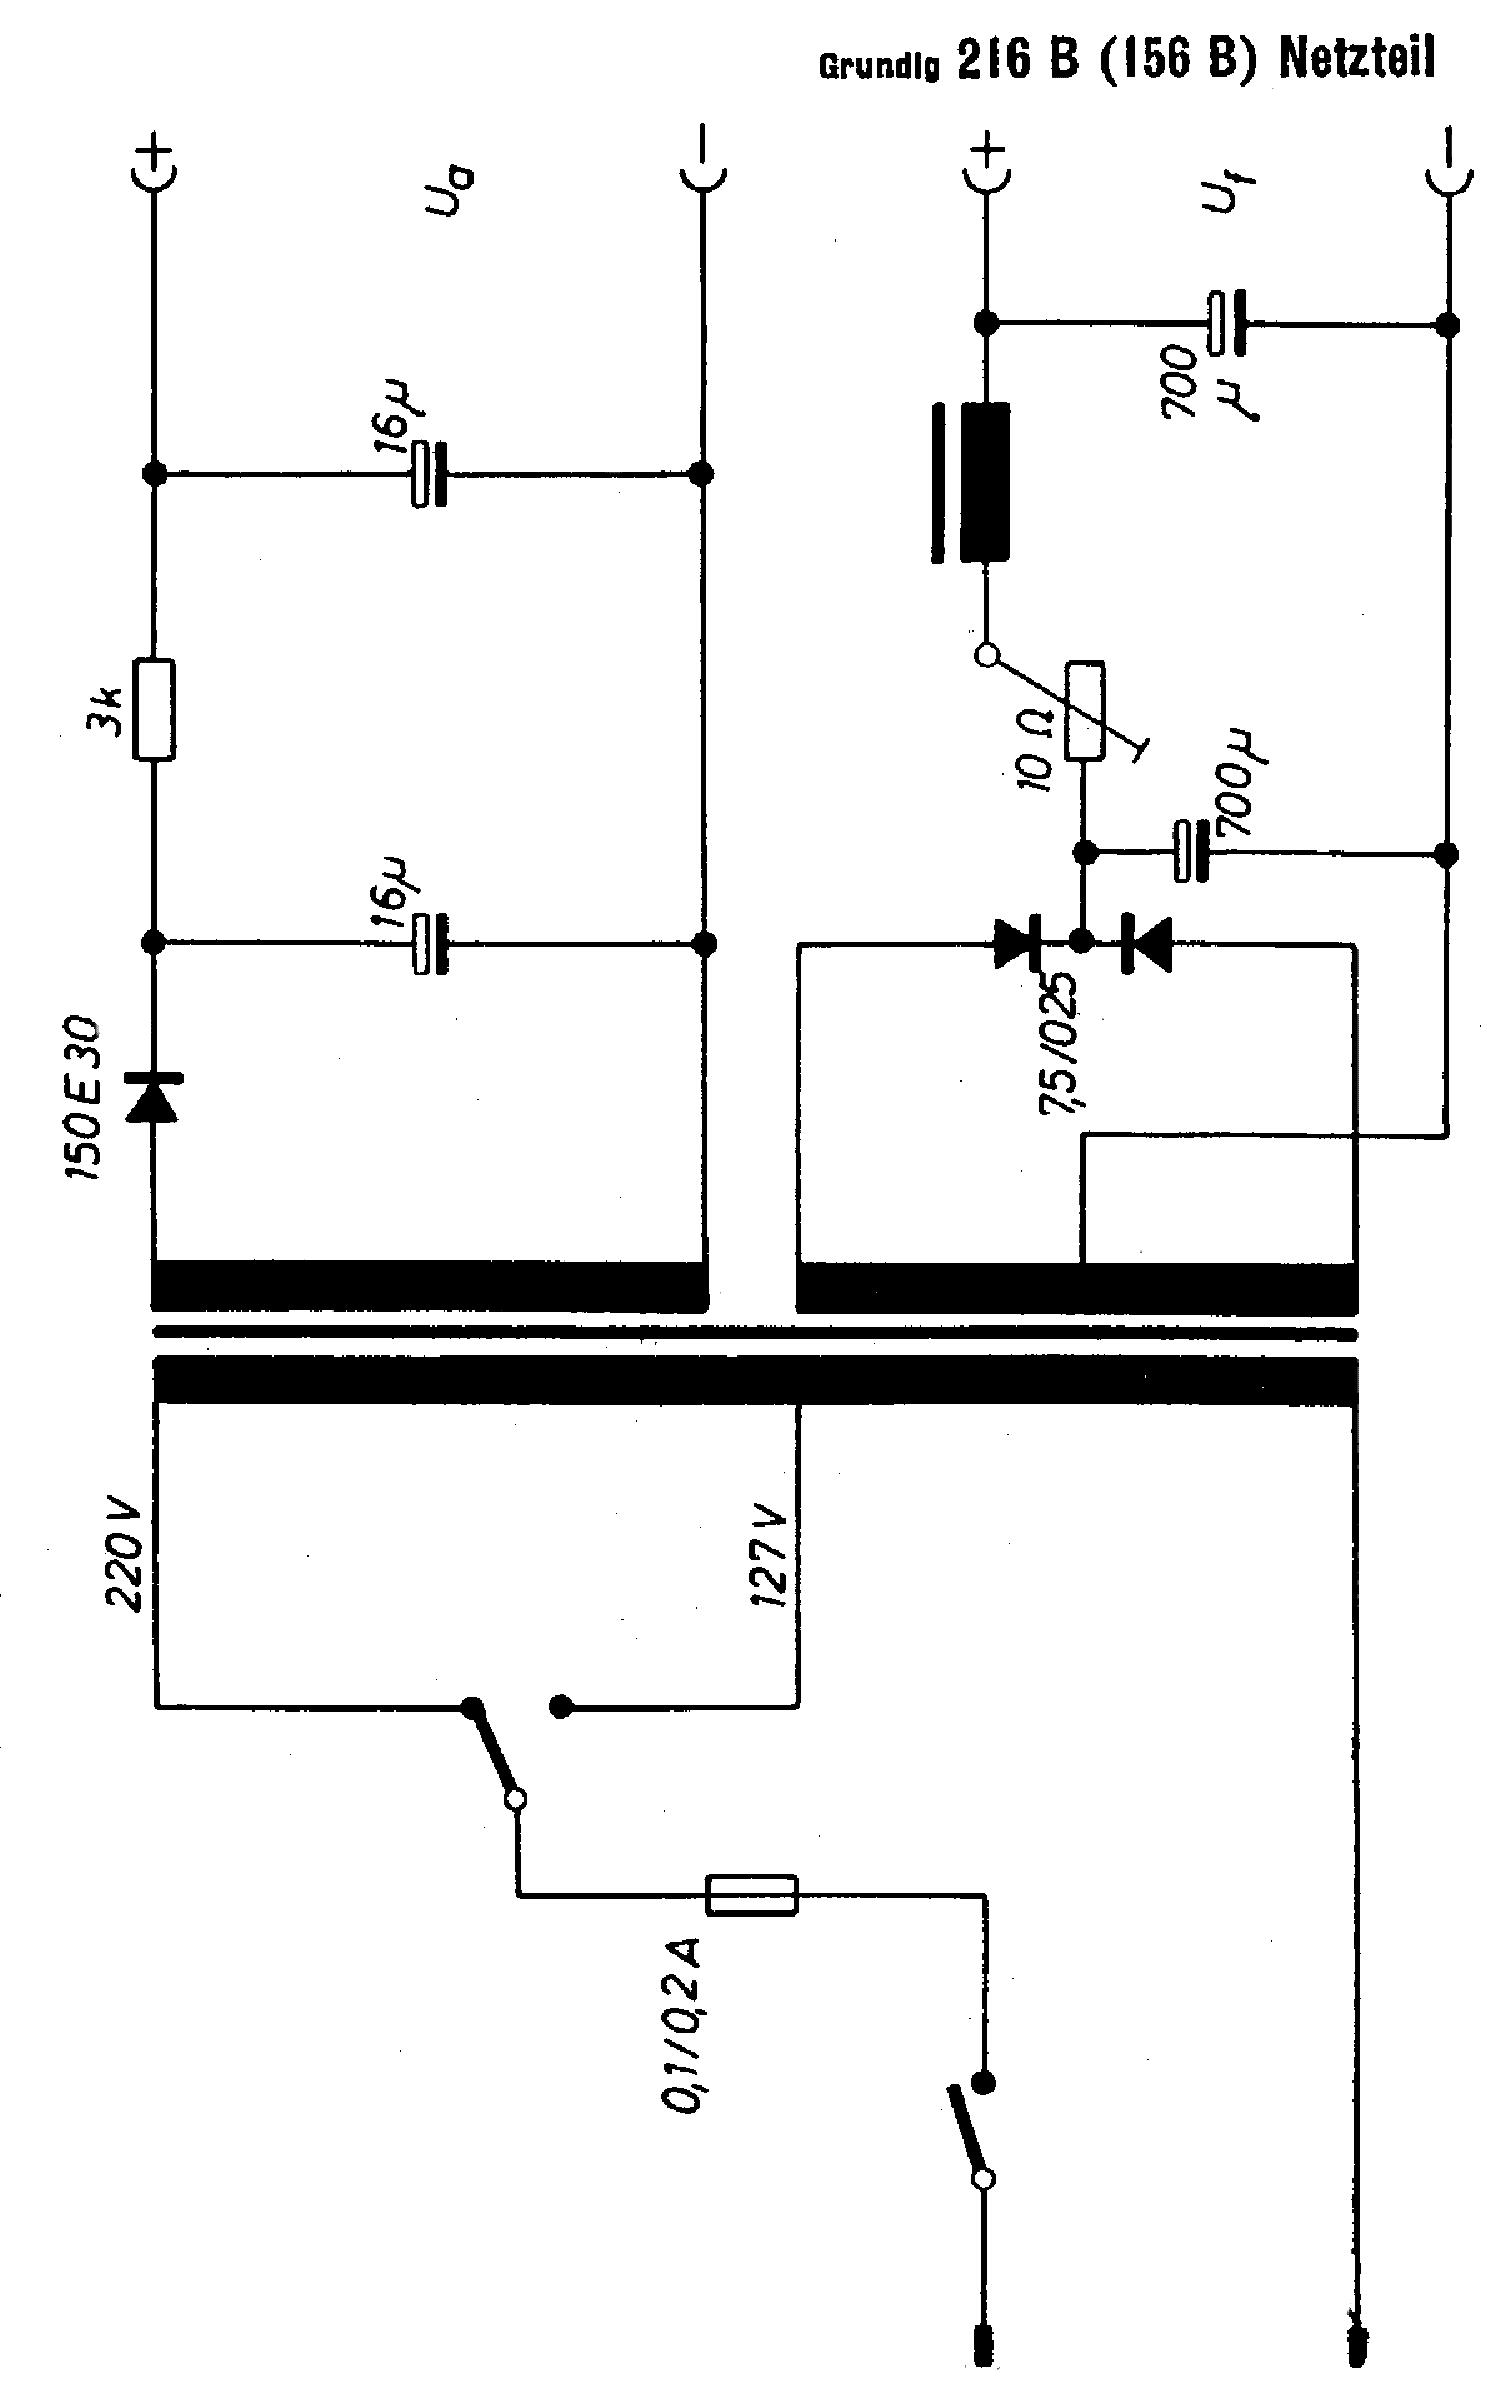 Grundig Mw Am Radio Receiver Sch Service Manual